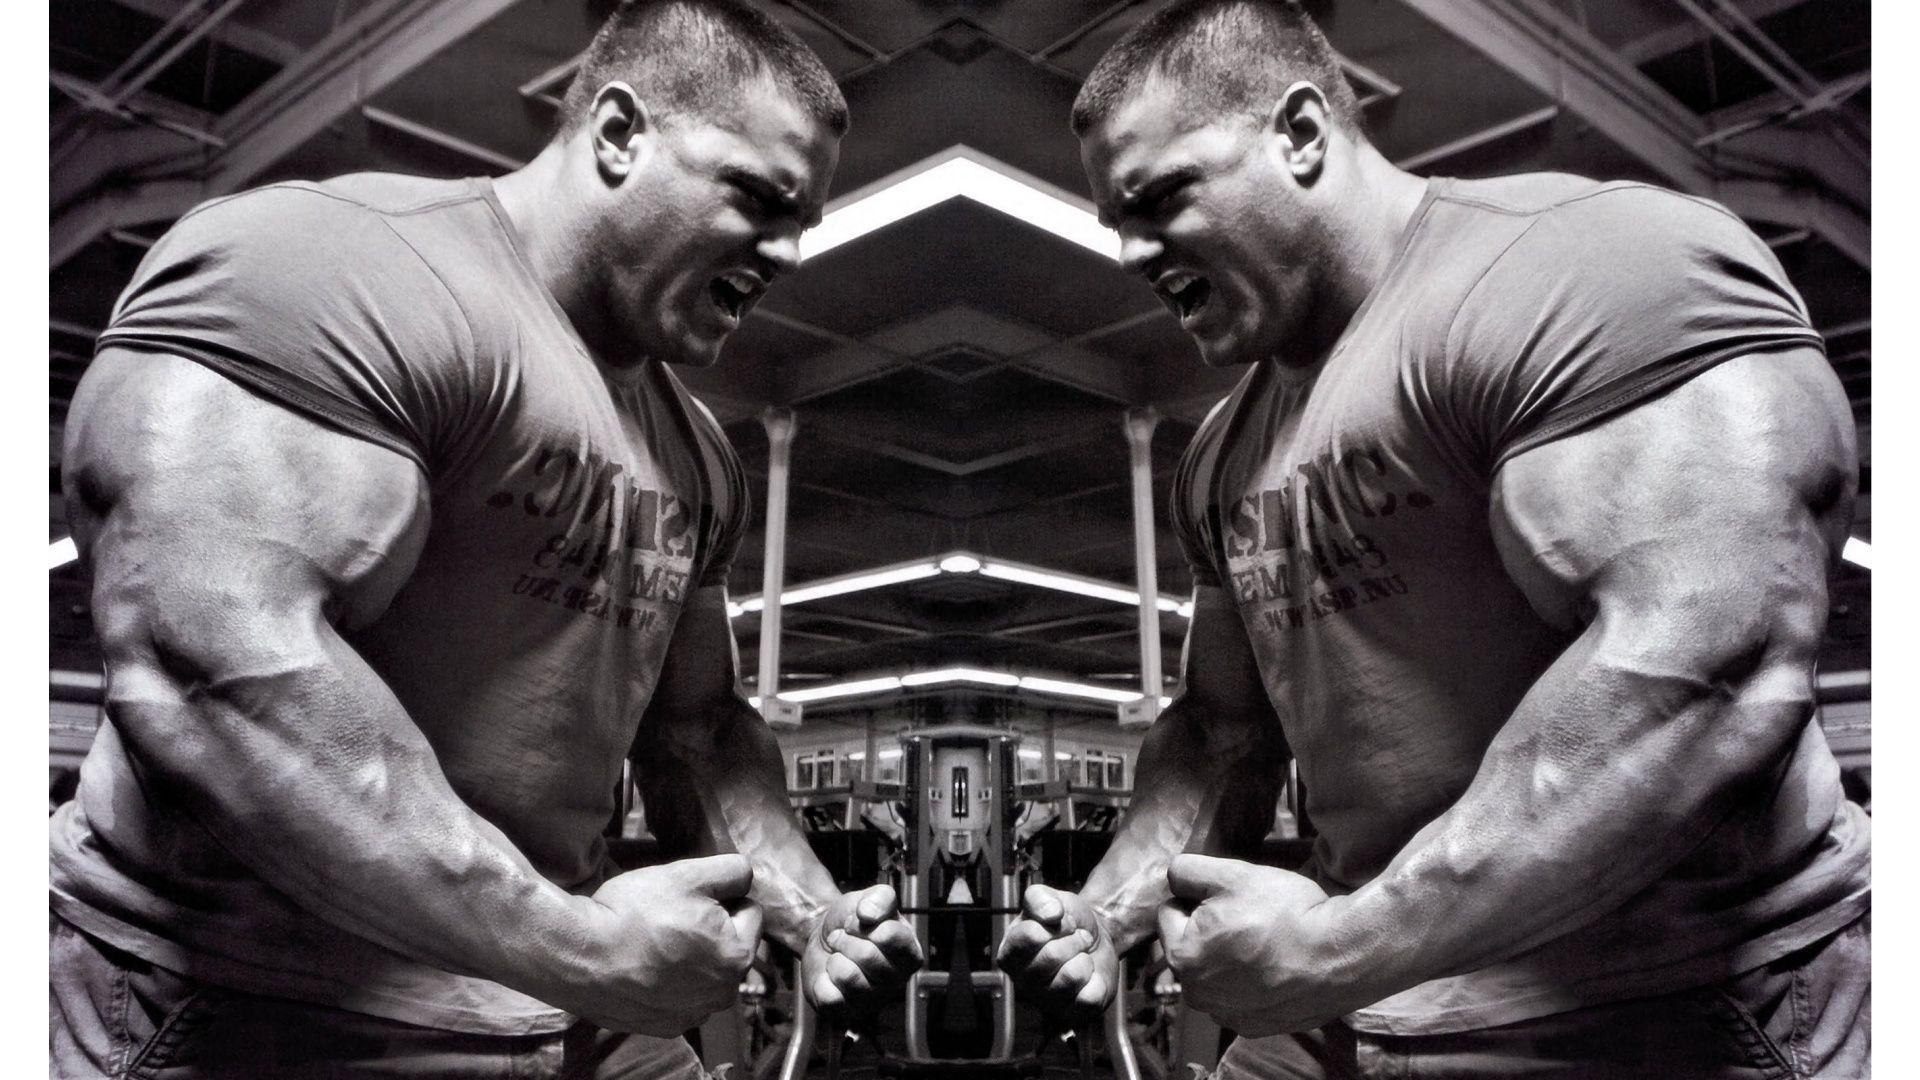 Картинки мышцами бодибилдинга как